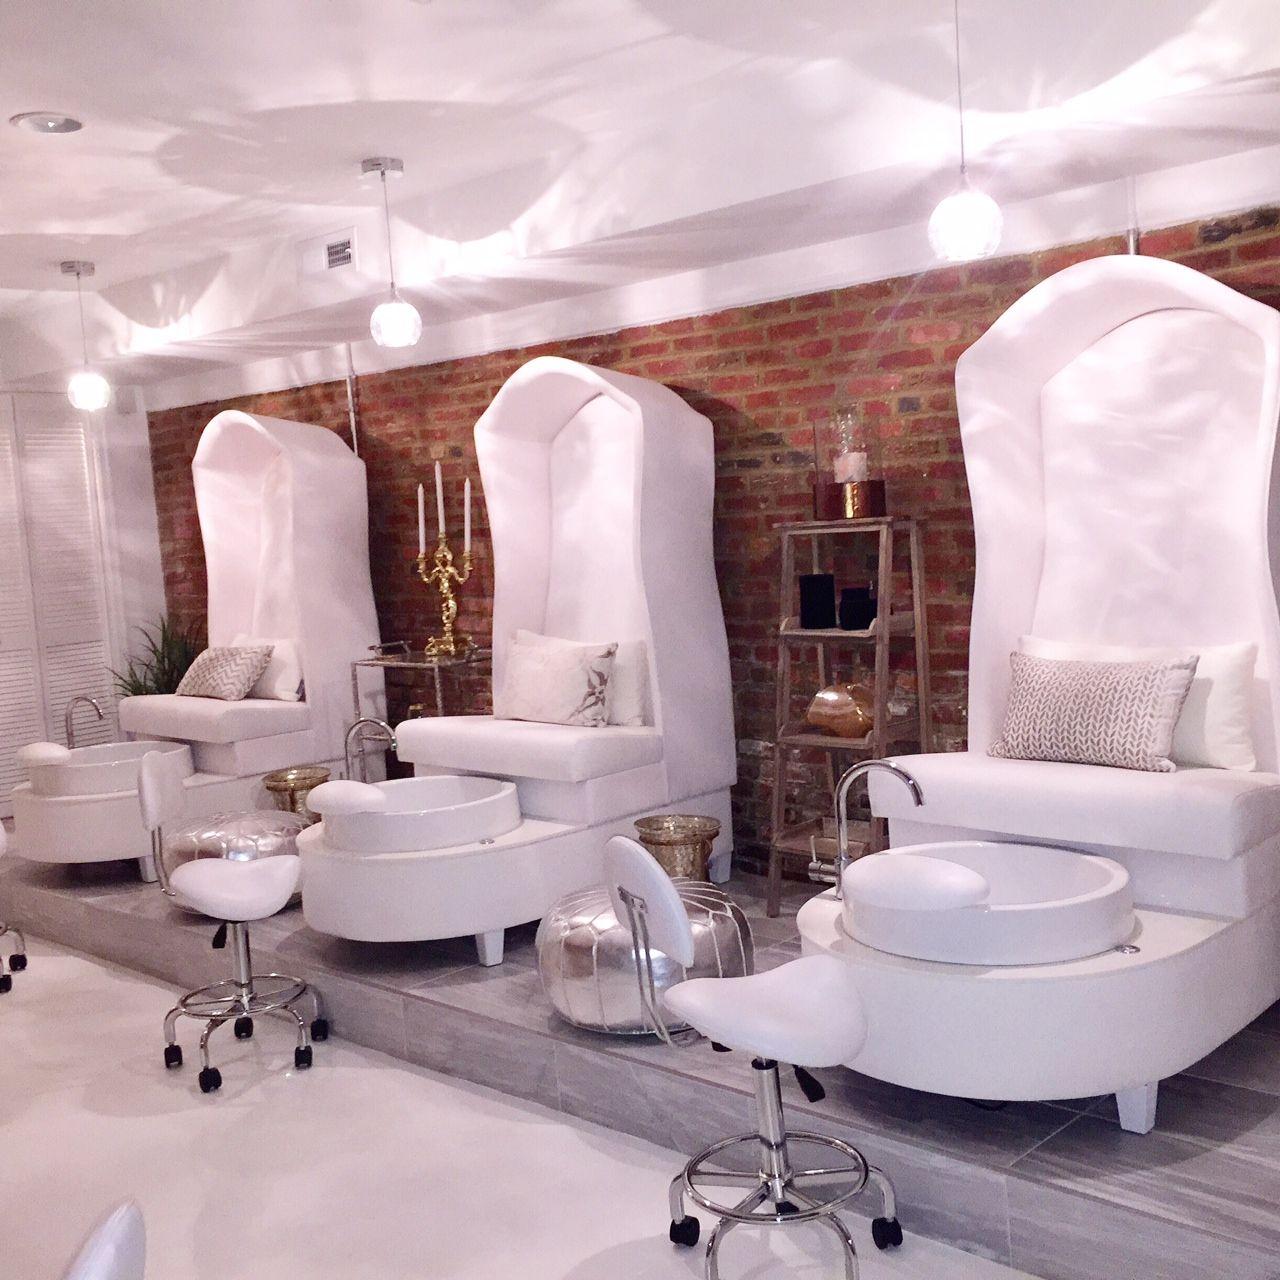 Pedicure Chair Ideas explore nail salon furniture pedicure chair and more Audrey Pedicure Chair